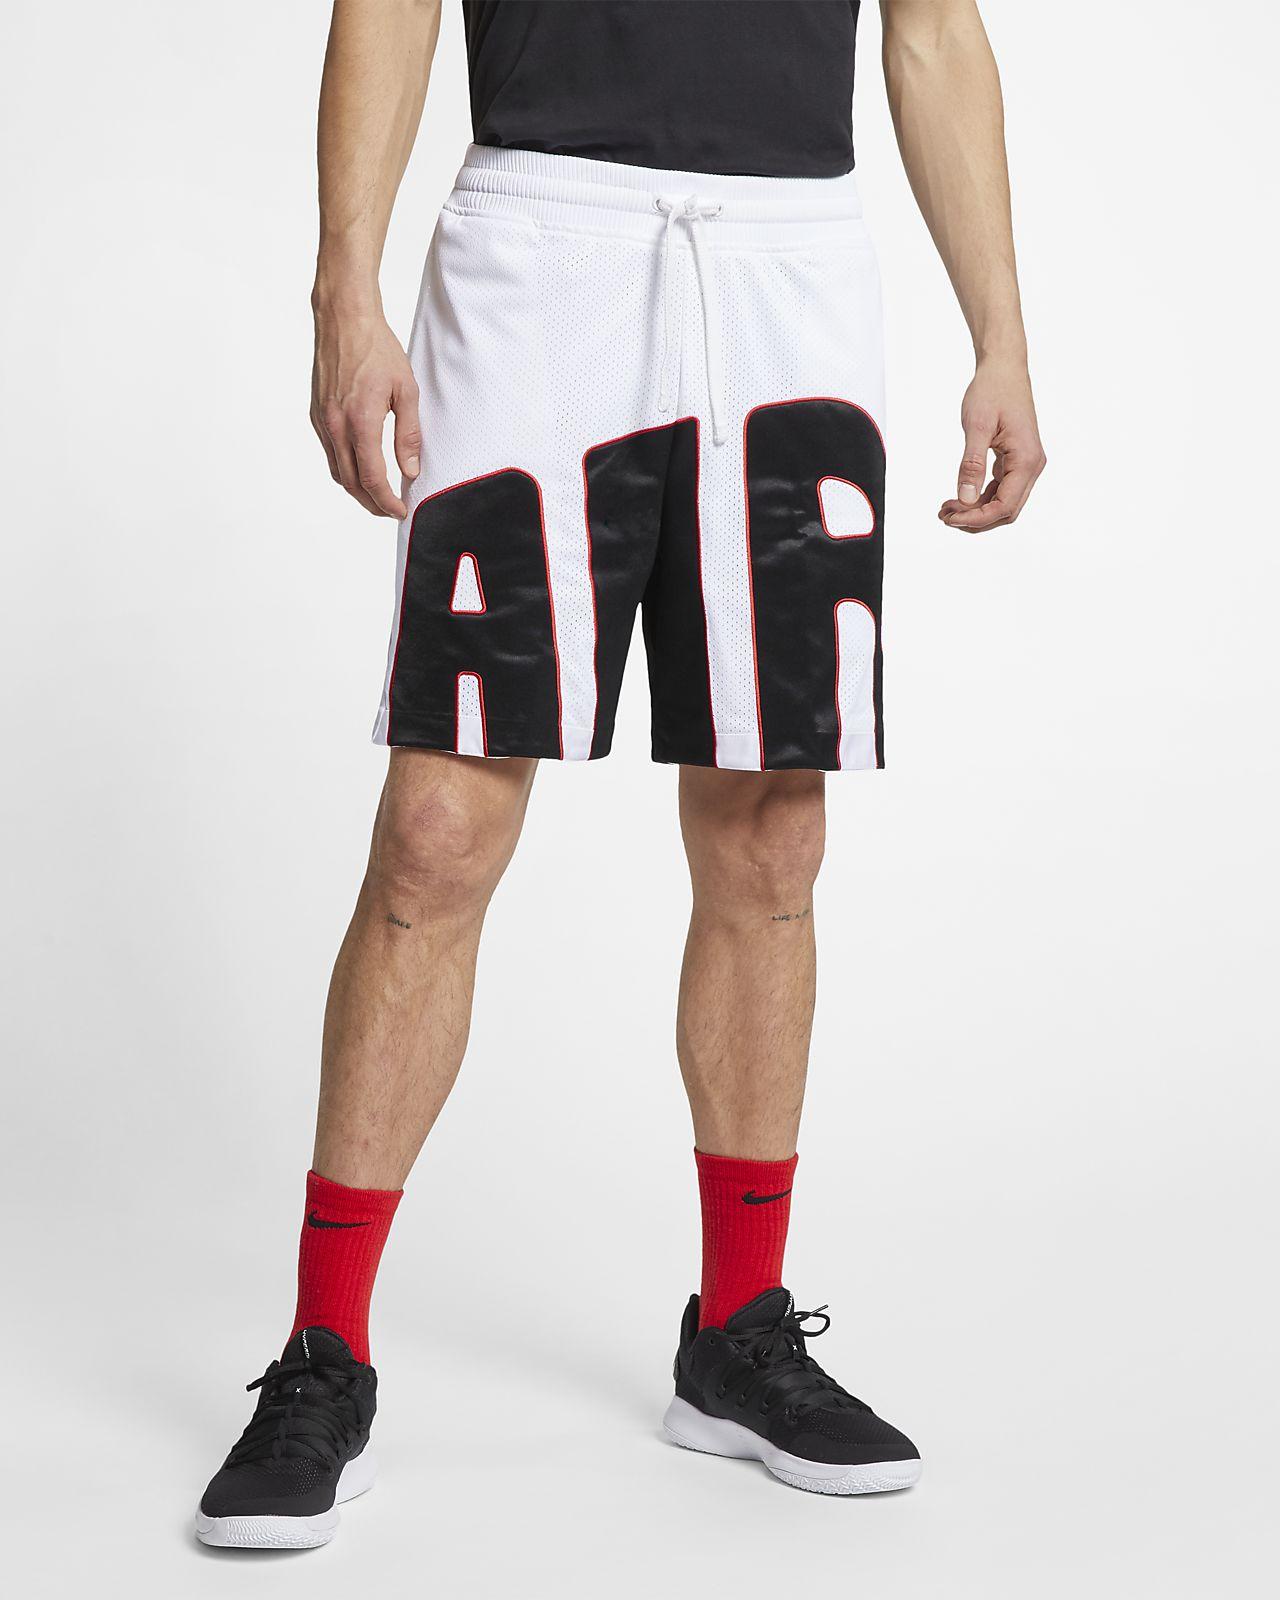 a3729915d726 Nike DNA Men s Mesh Basketball Shorts. Nike.com CA